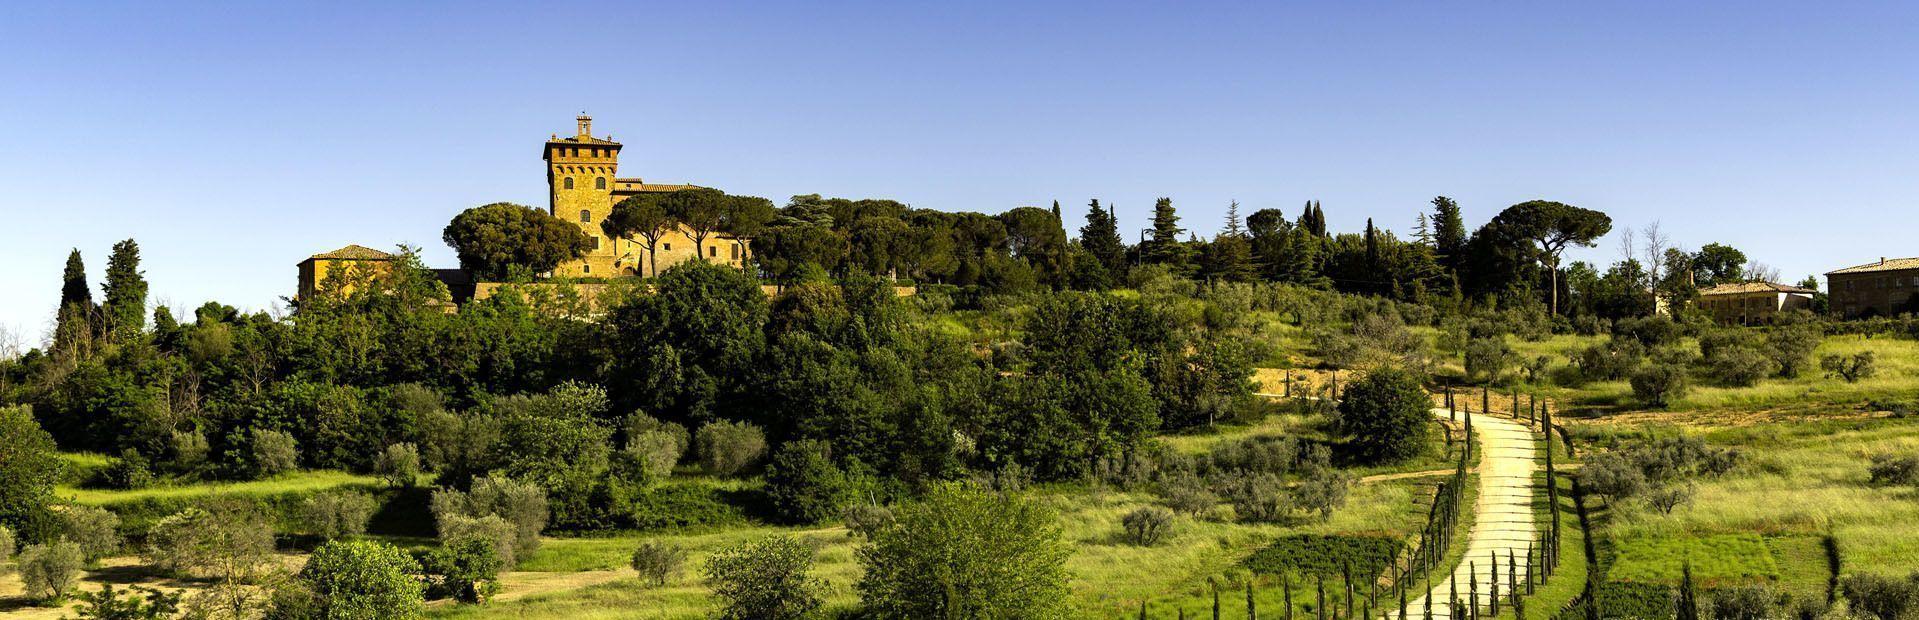 Via Francigena: in cammino da Lucca a Siena